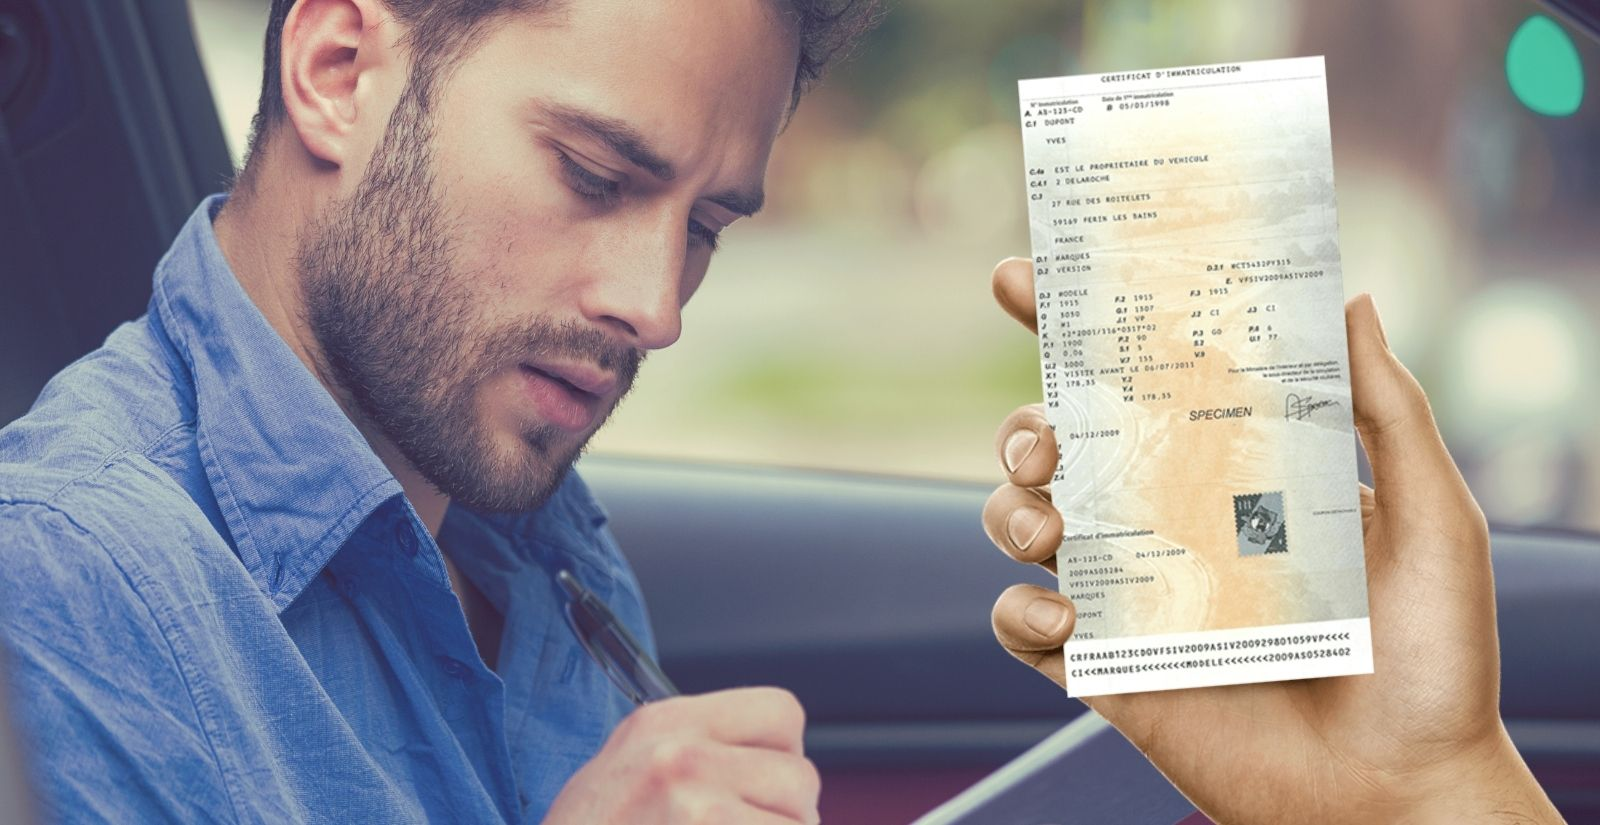 Perte carte grise et acte de vente / certificat d'immatriculation